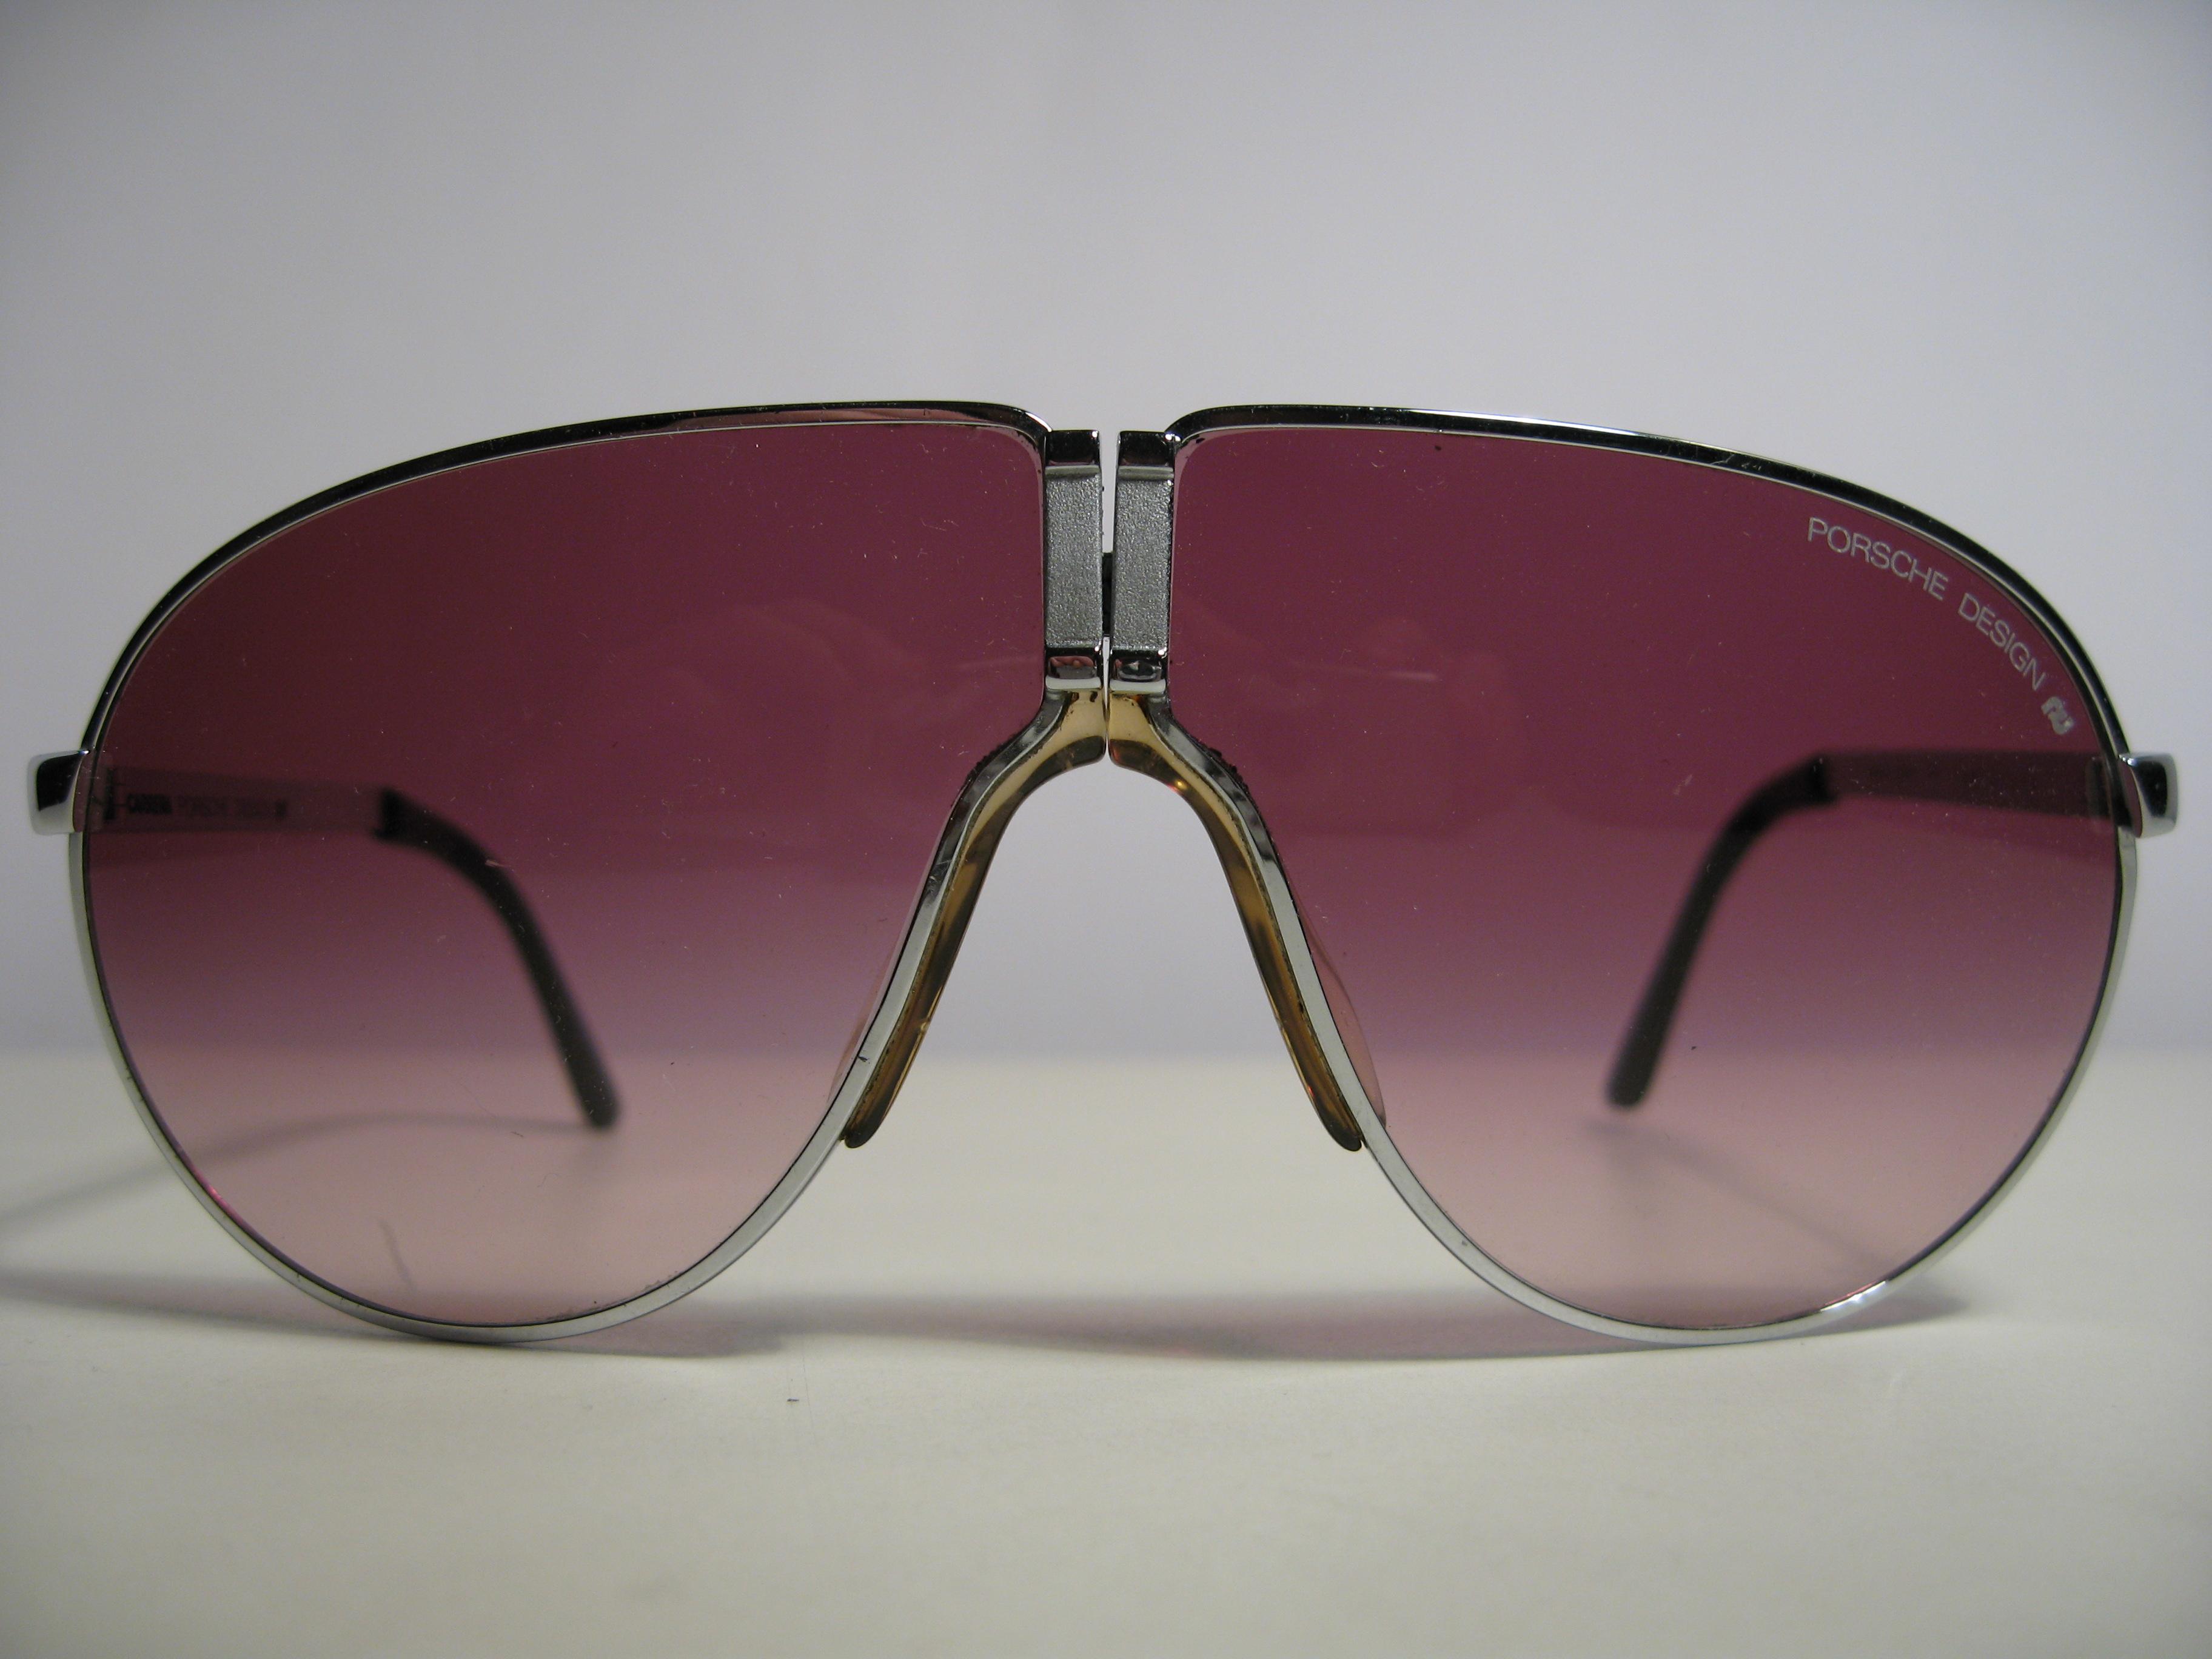 1980 porsche sunglasses celebrity